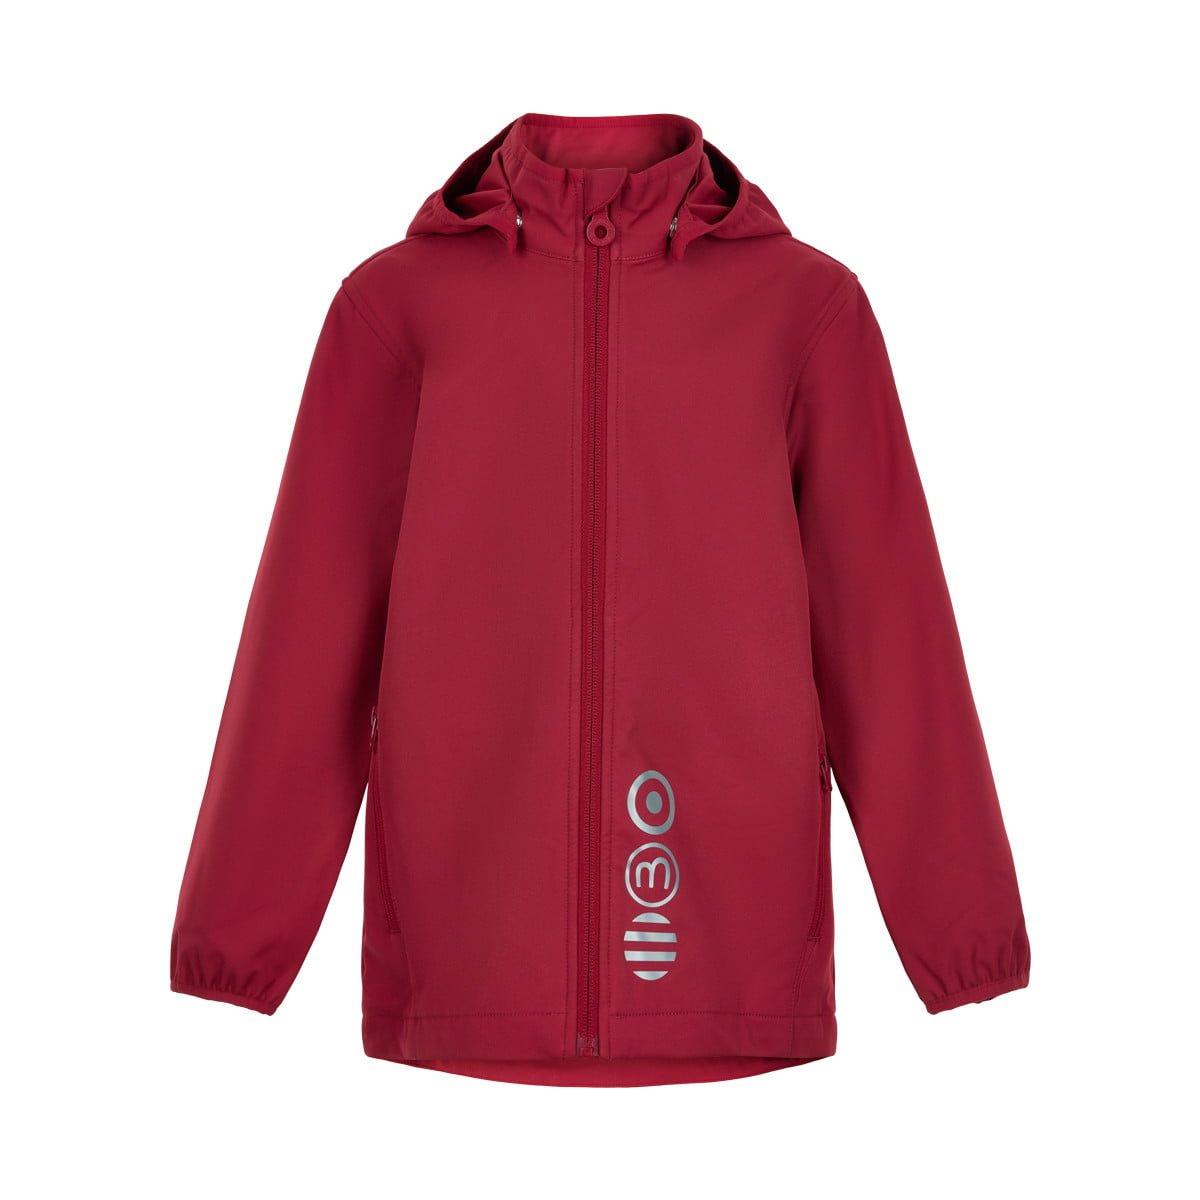 Jachetă de ploaie și vânt (impermeabilă) din softshell Deep Claret Minymo